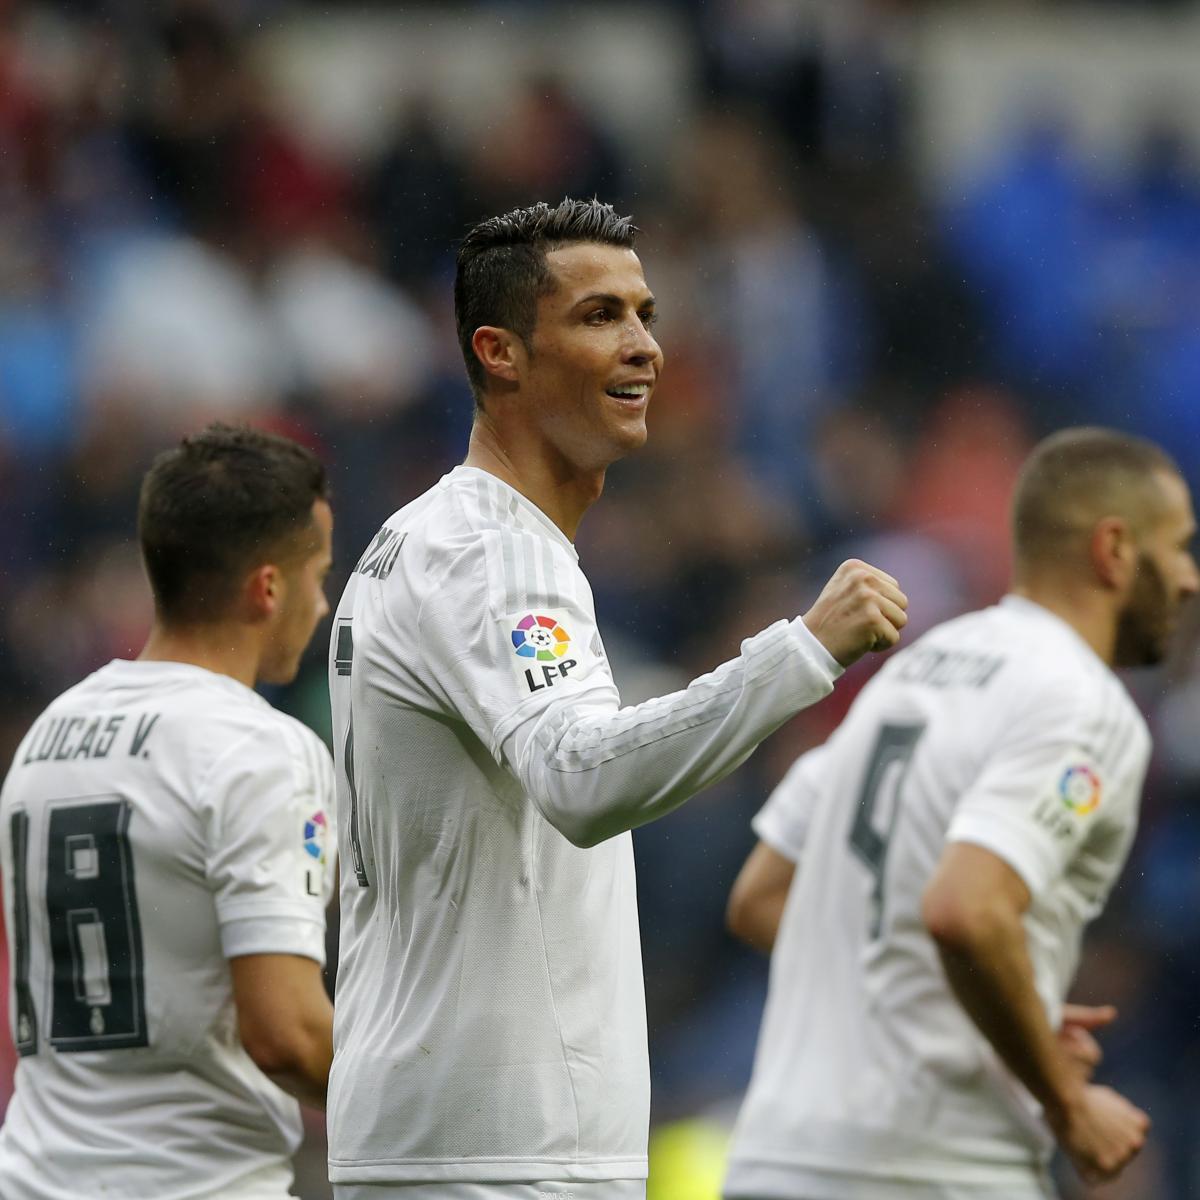 Champions League 2019 Round Of 16 Leg 2 Live Stream Tv: Champions League 2016: Round-of-16 Leg 1 Live Stream, TV